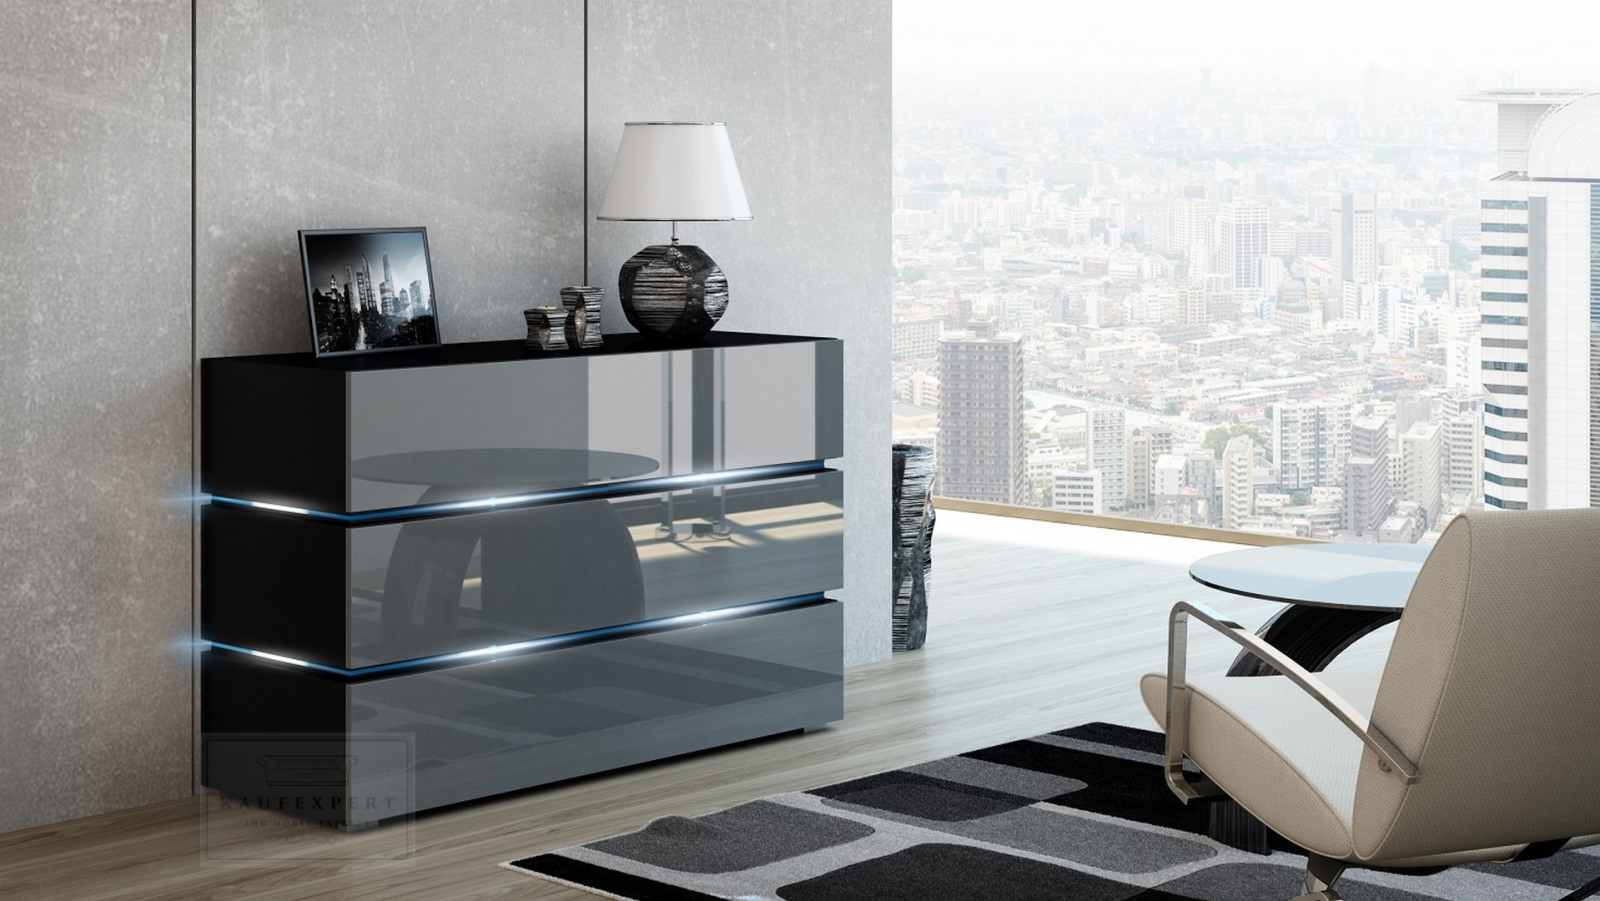 Wohnwand Dream Grau Hochglanz/Schwarz Matt 332 Cm Mediawand Medienwand Design